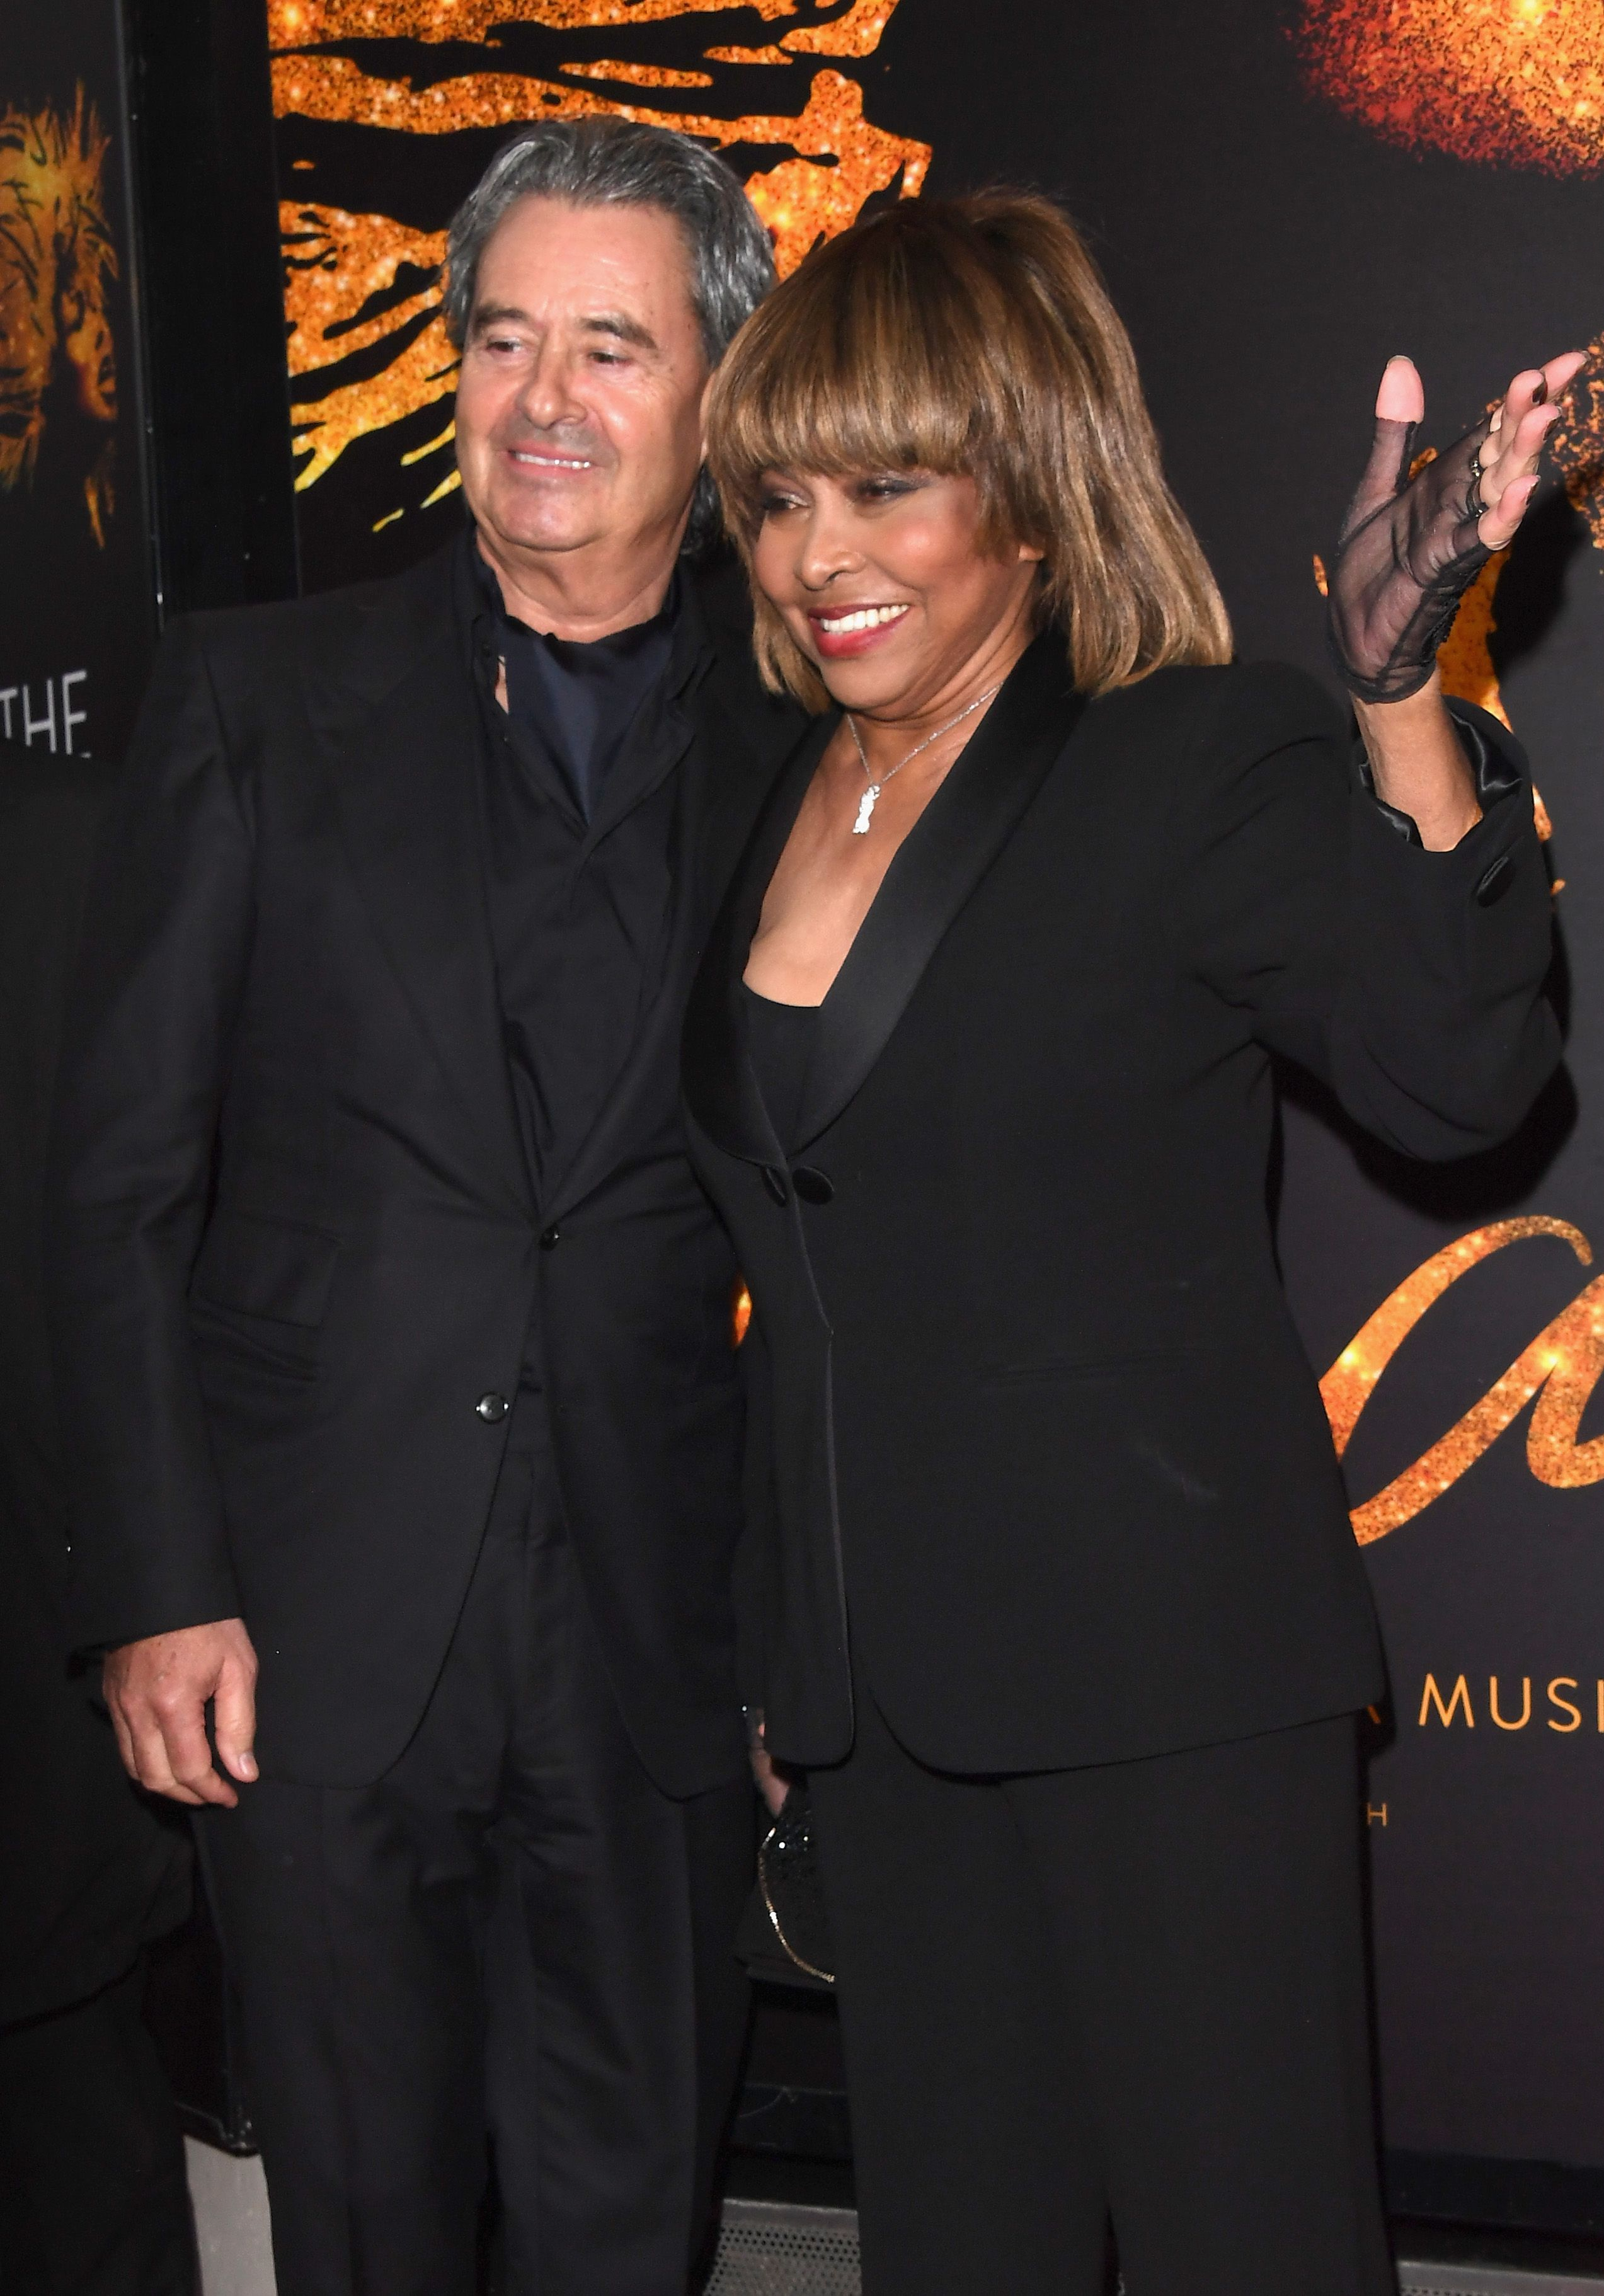 Turner erwin age difference bach tina Tina Turner,